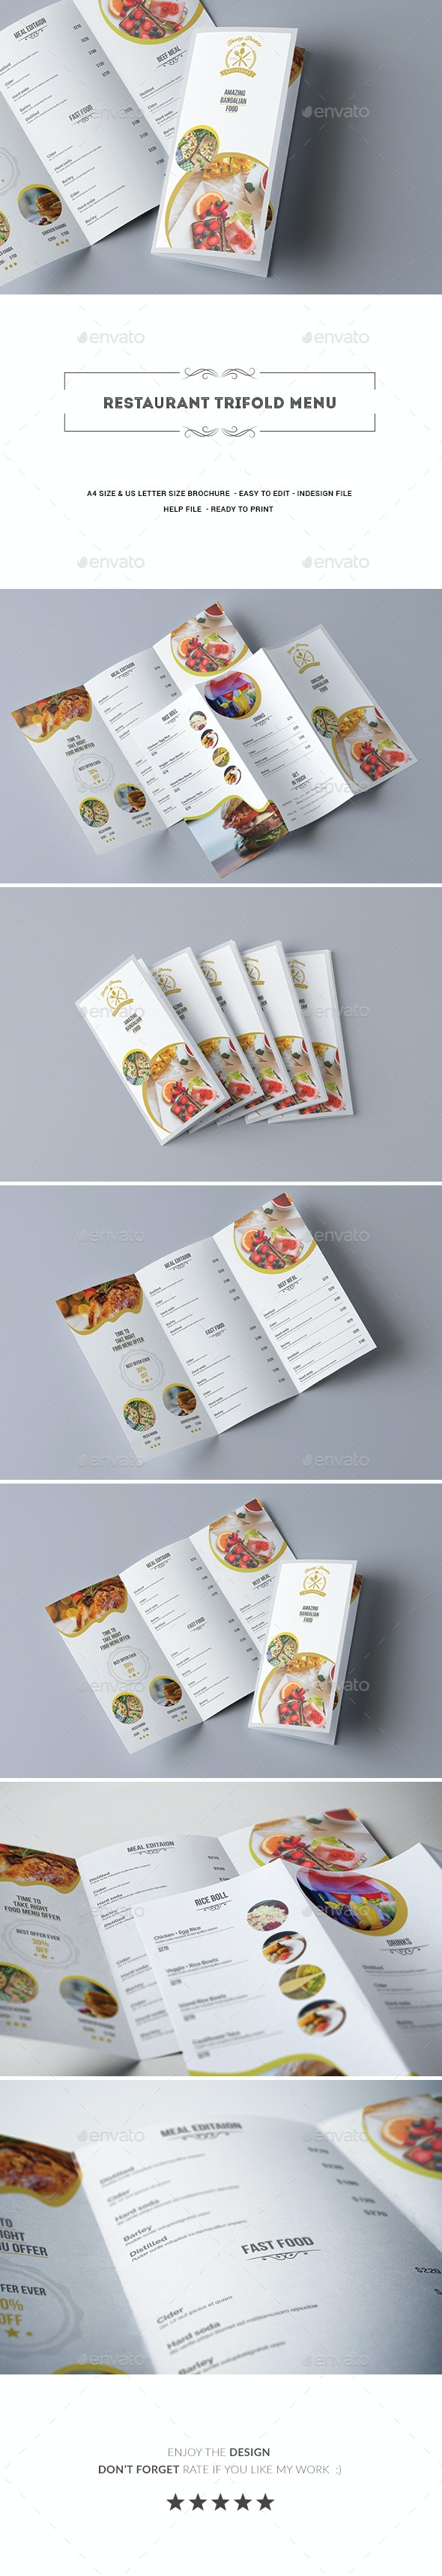 Restaurant Trifold Menu - Food Menus Print Templates